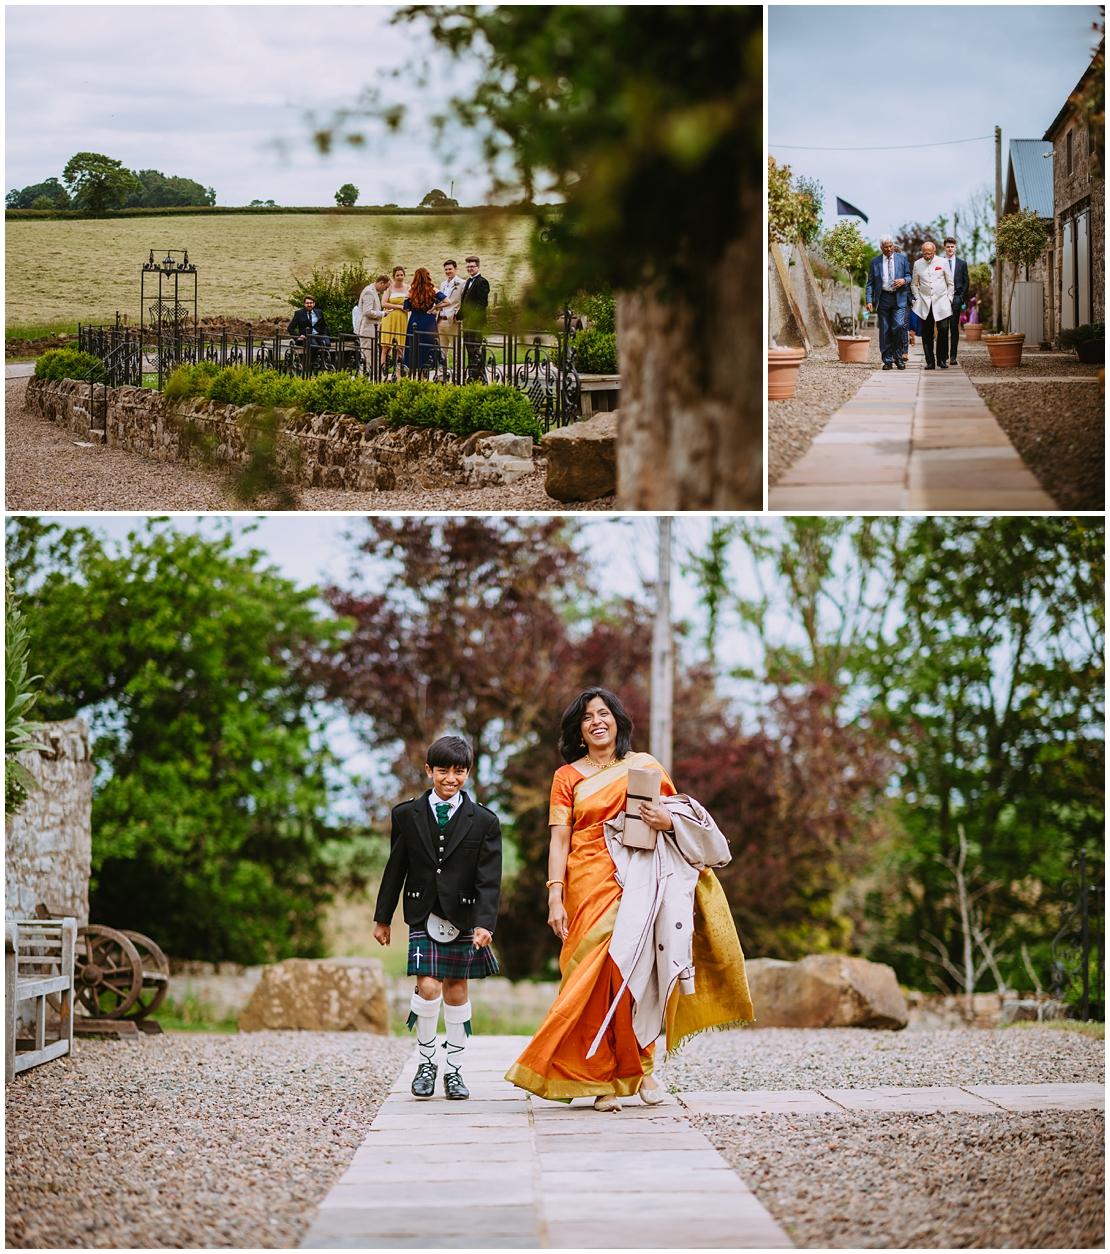 doxford barns wedding photography katie vivek 0018